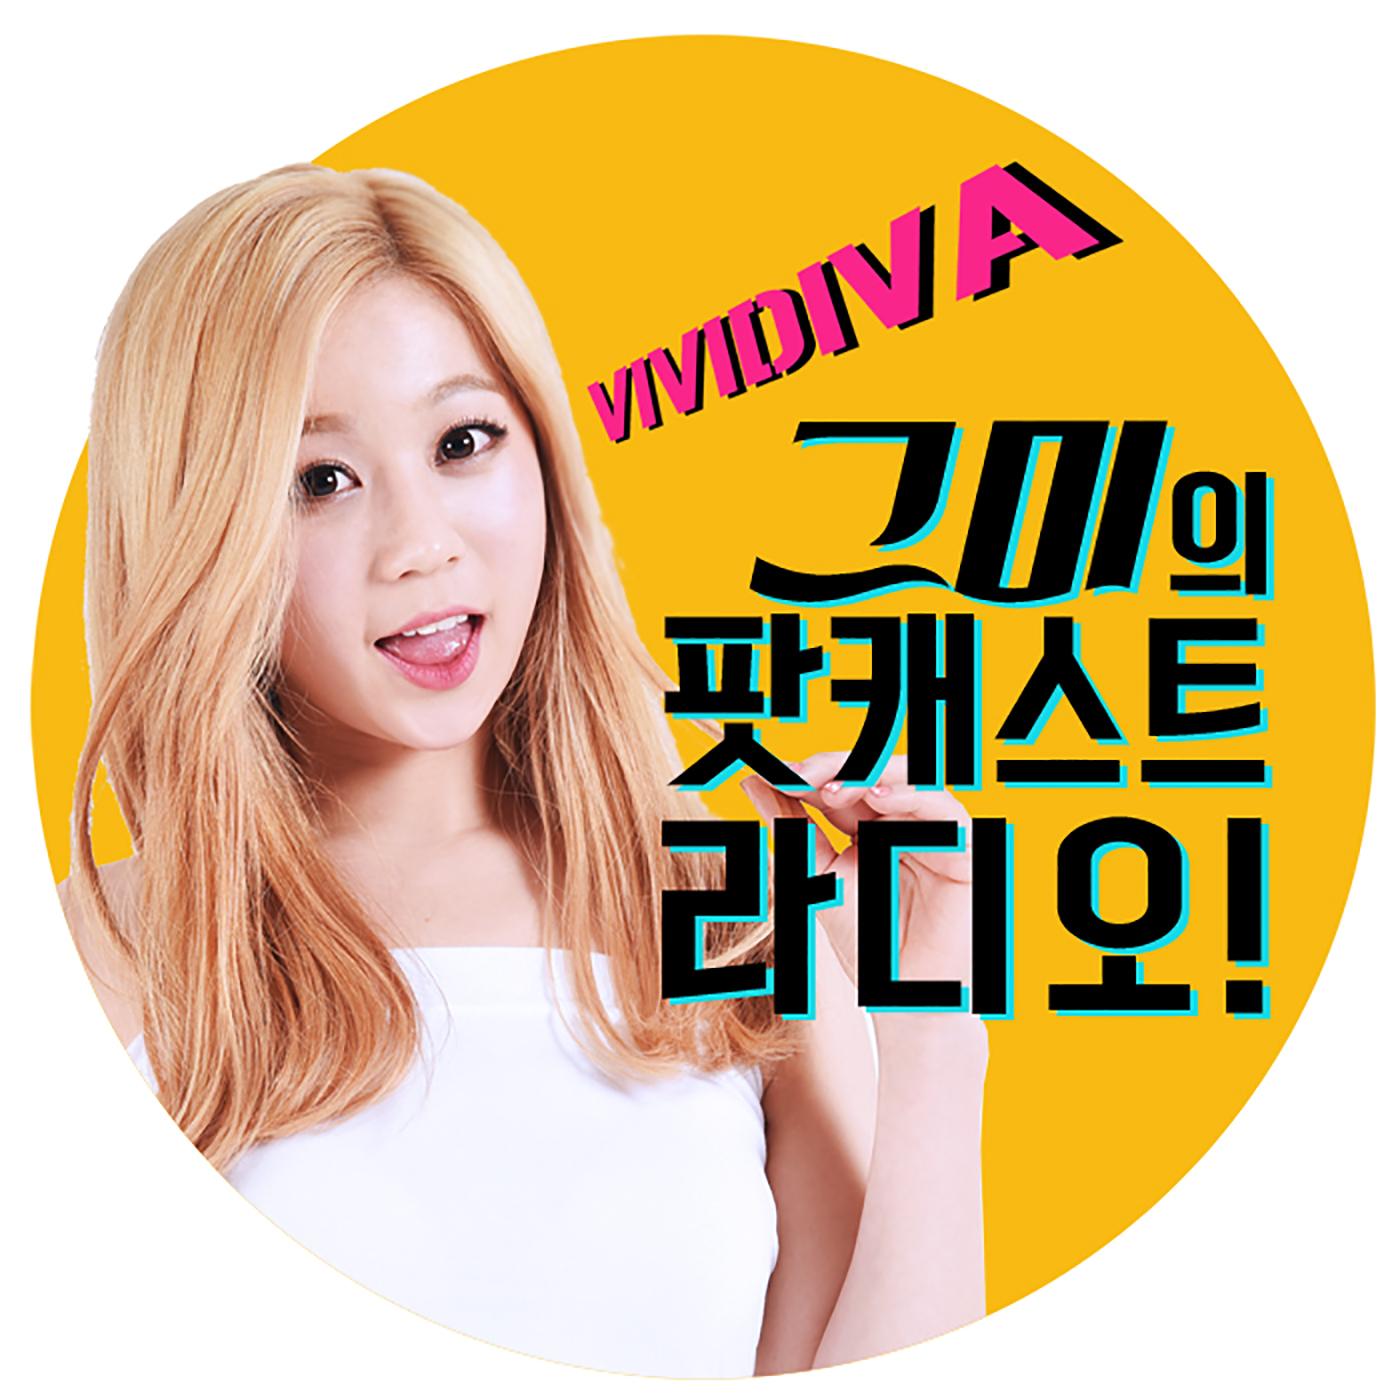 ViViDIVA 그미의 팟캐스트 라디오